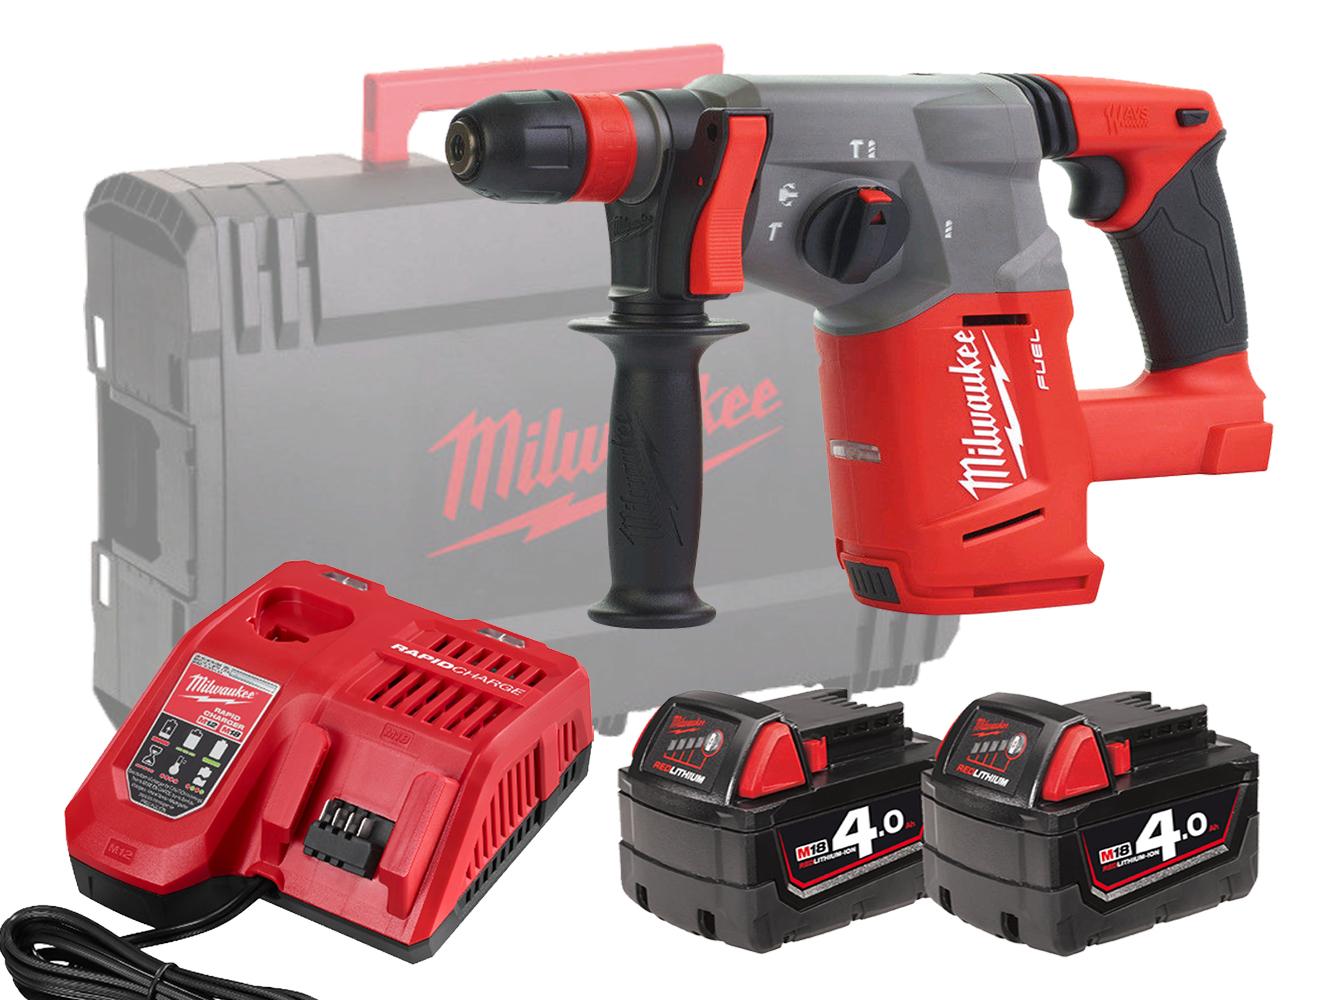 Milwaukee M18CHX 18V Fuel Brushless SDS+ 3-Mode Hammer Drill - 4.0Ah Pack